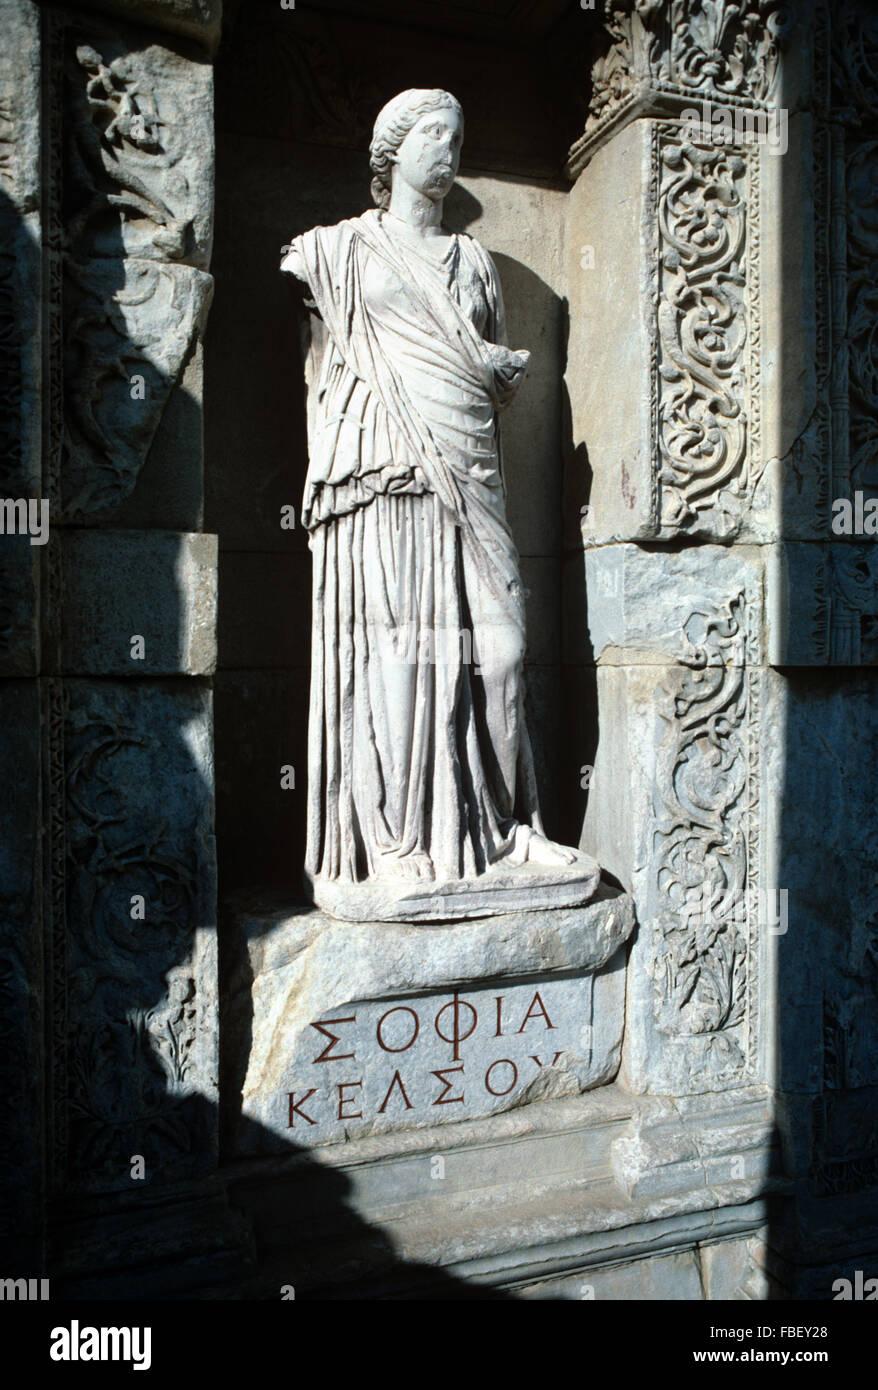 Goddess Sophia, Personification of Wisdom Statue (110-135AD) Celsus Library, Ephesus, Turkey - Stock Image